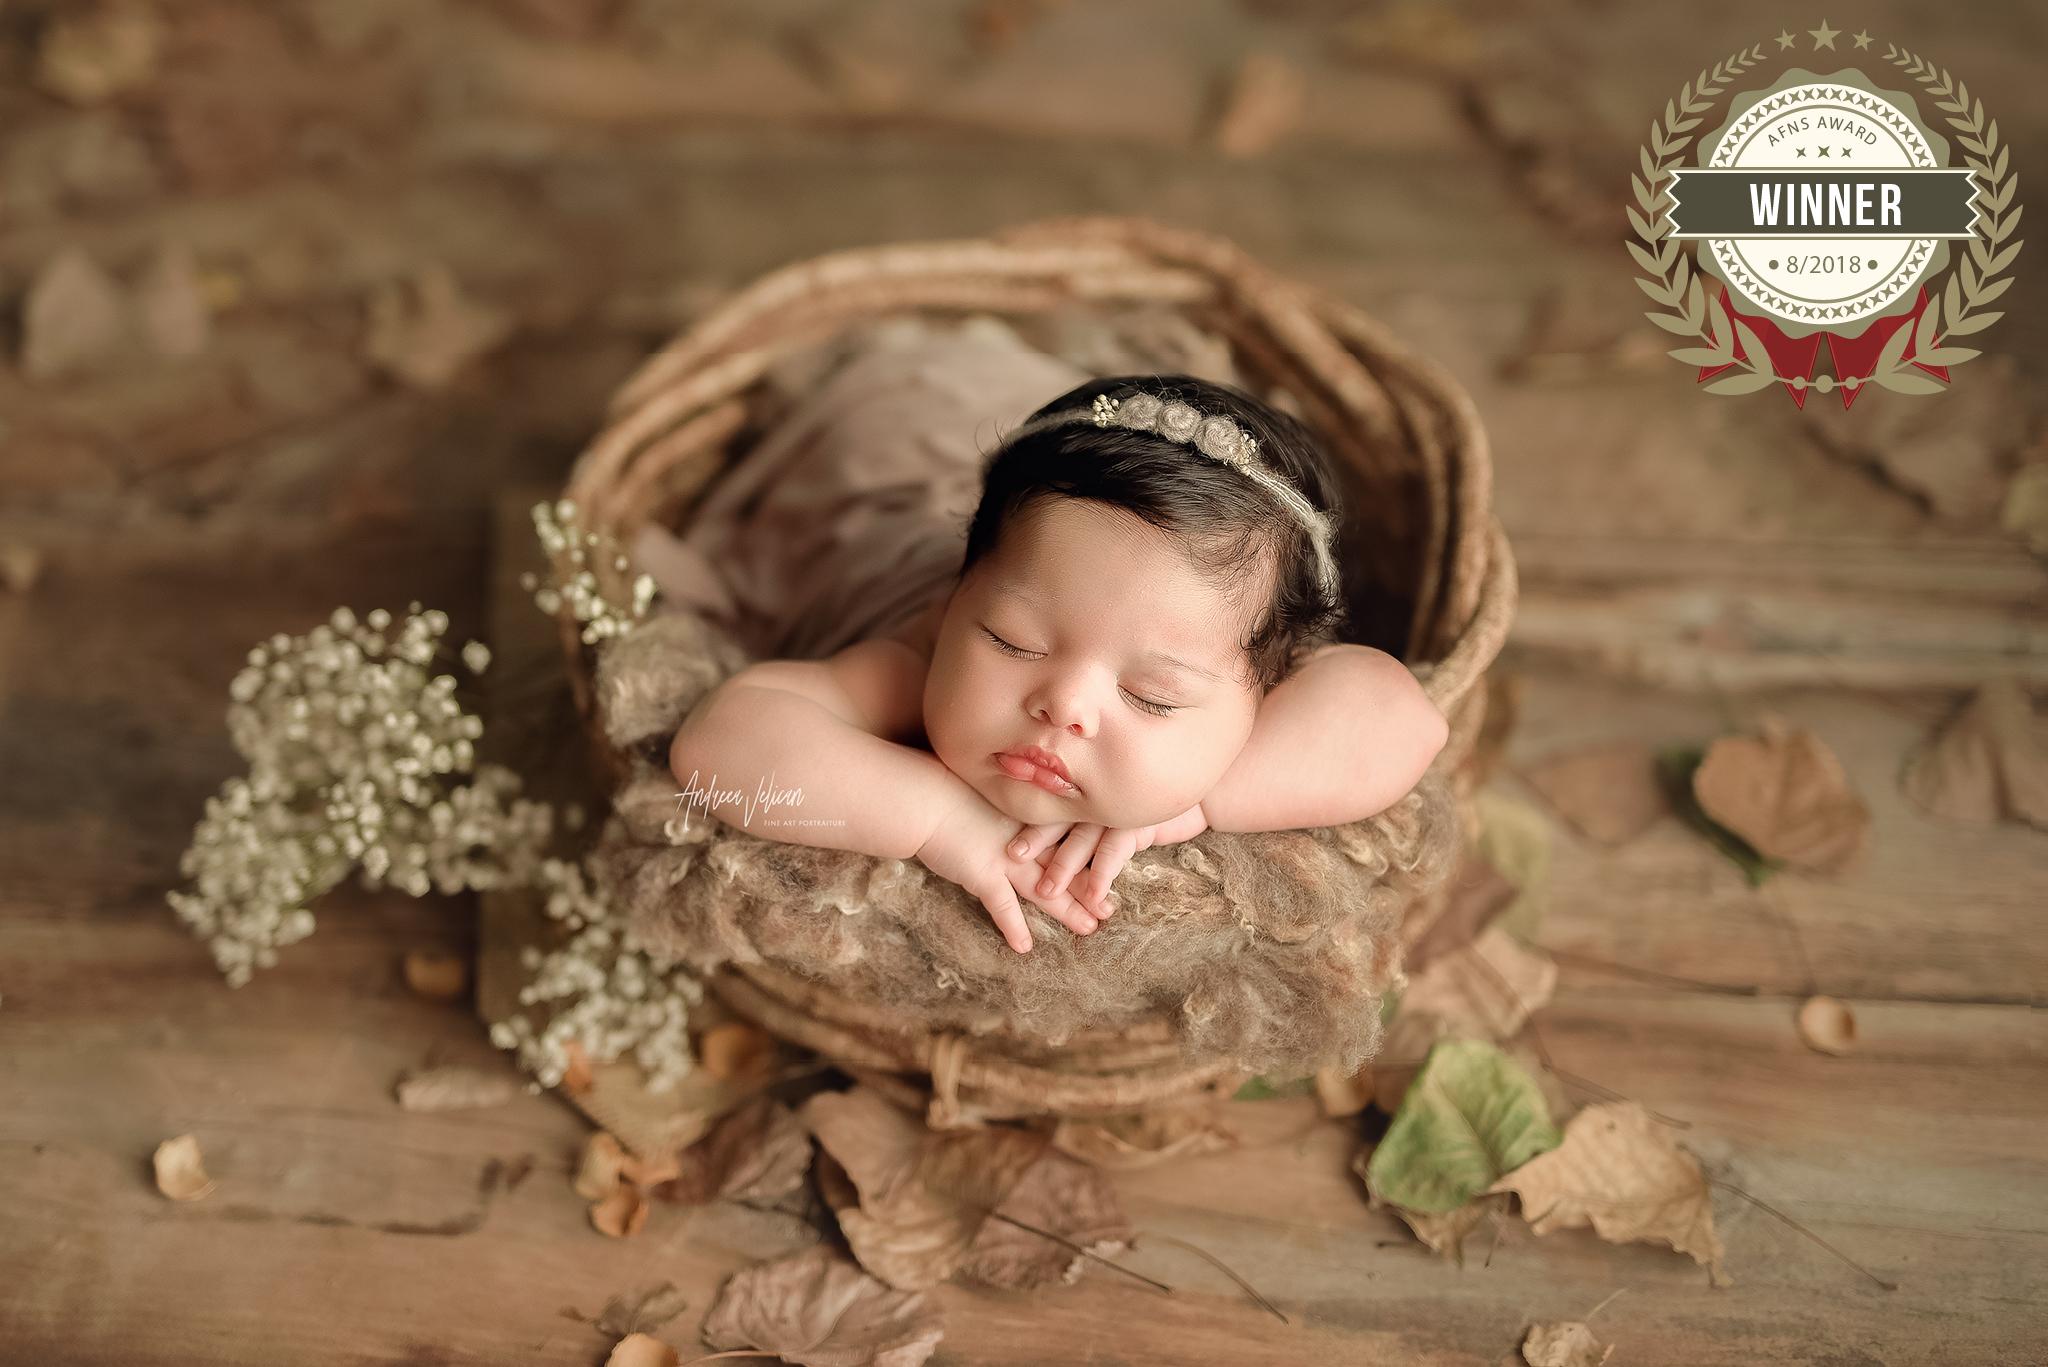 56906439_andreea_velican_-_newborn.jpg